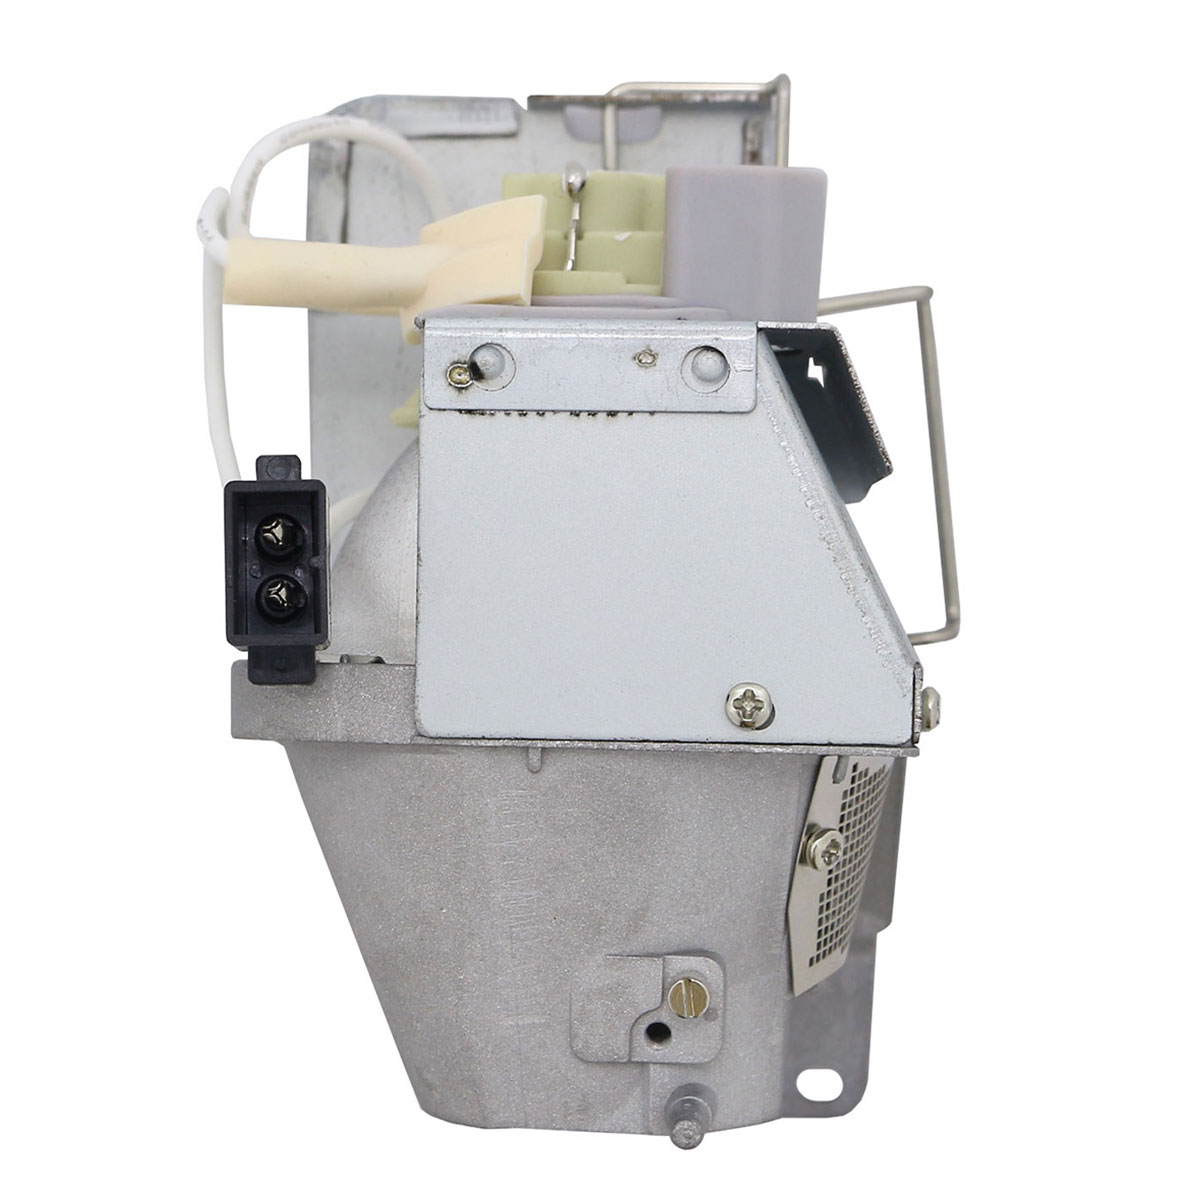 Lutema Platinum for Acer MR.JJU11.002 Projector Lamp (Original Philips Bulb) - image 2 de 5